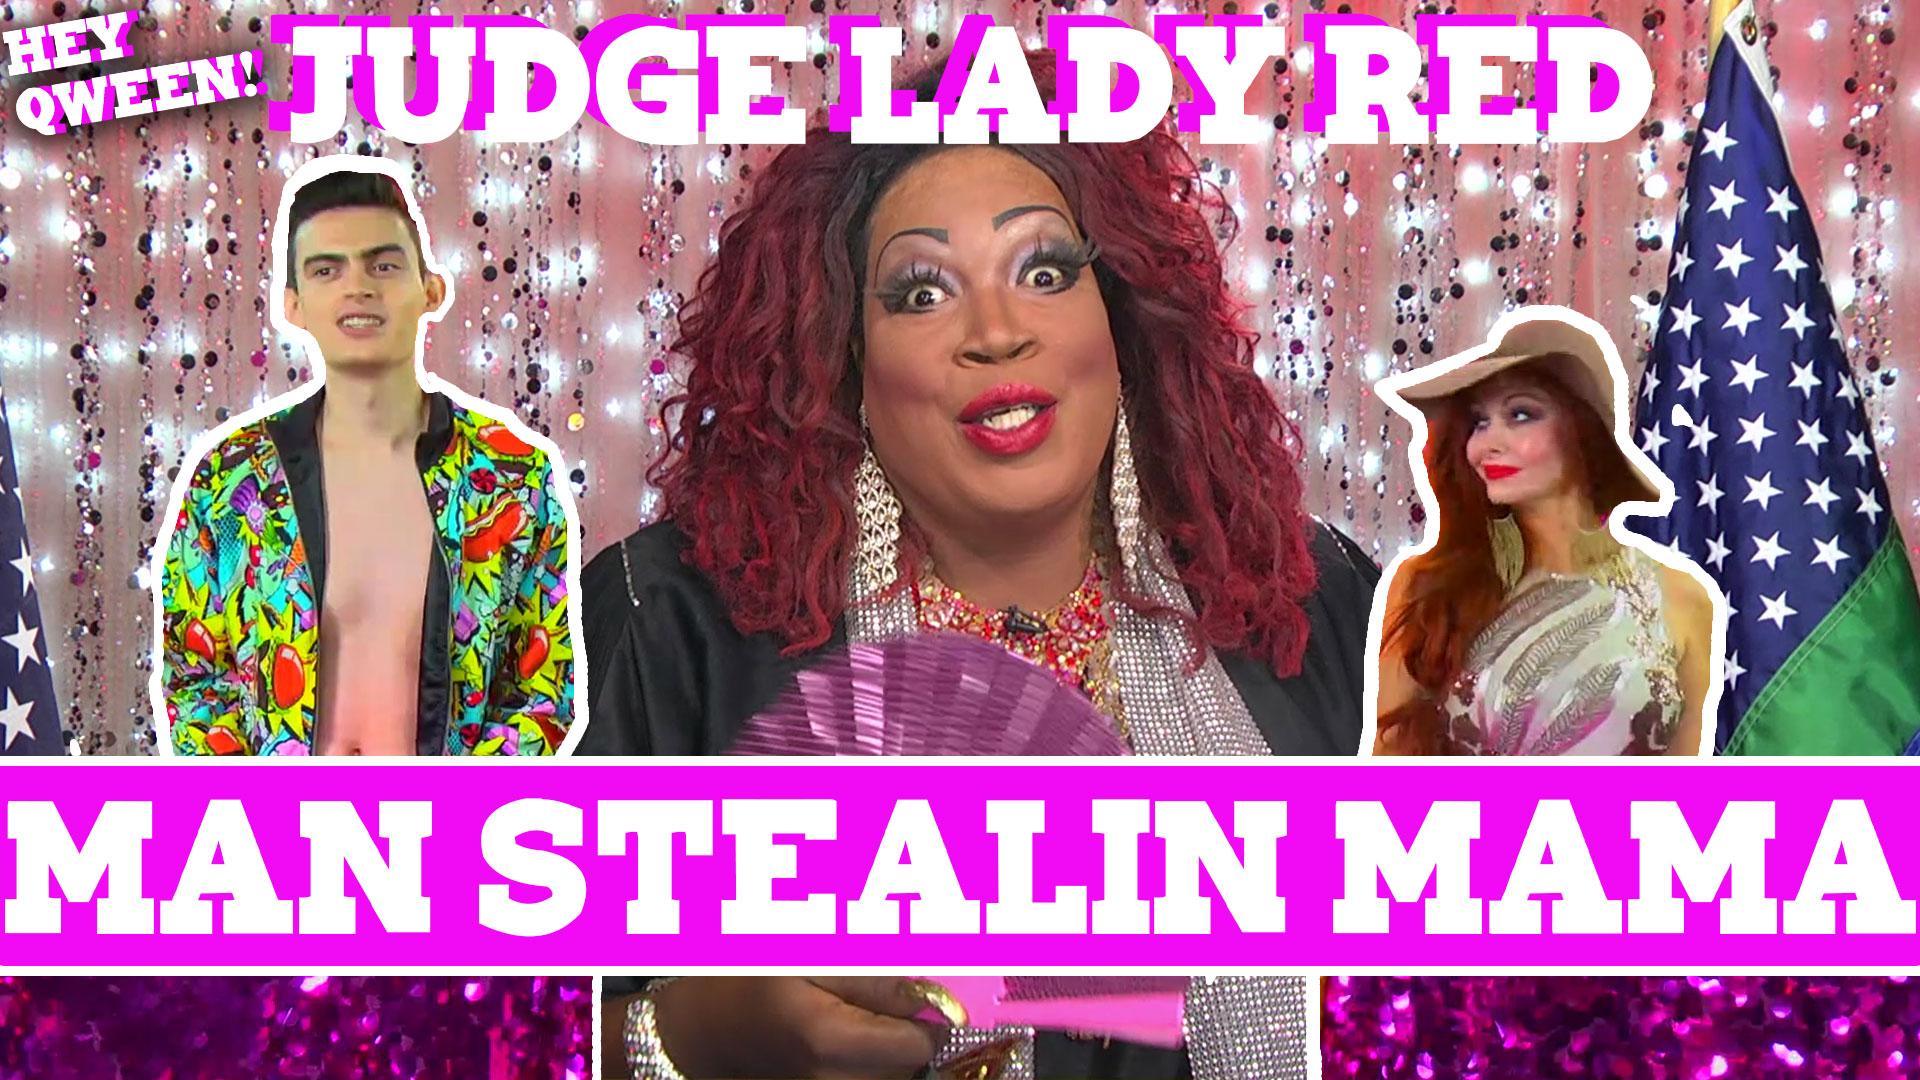 Judge Lady Red: Shade or No Shade S2E3: Case of The Man Stealin' Mama